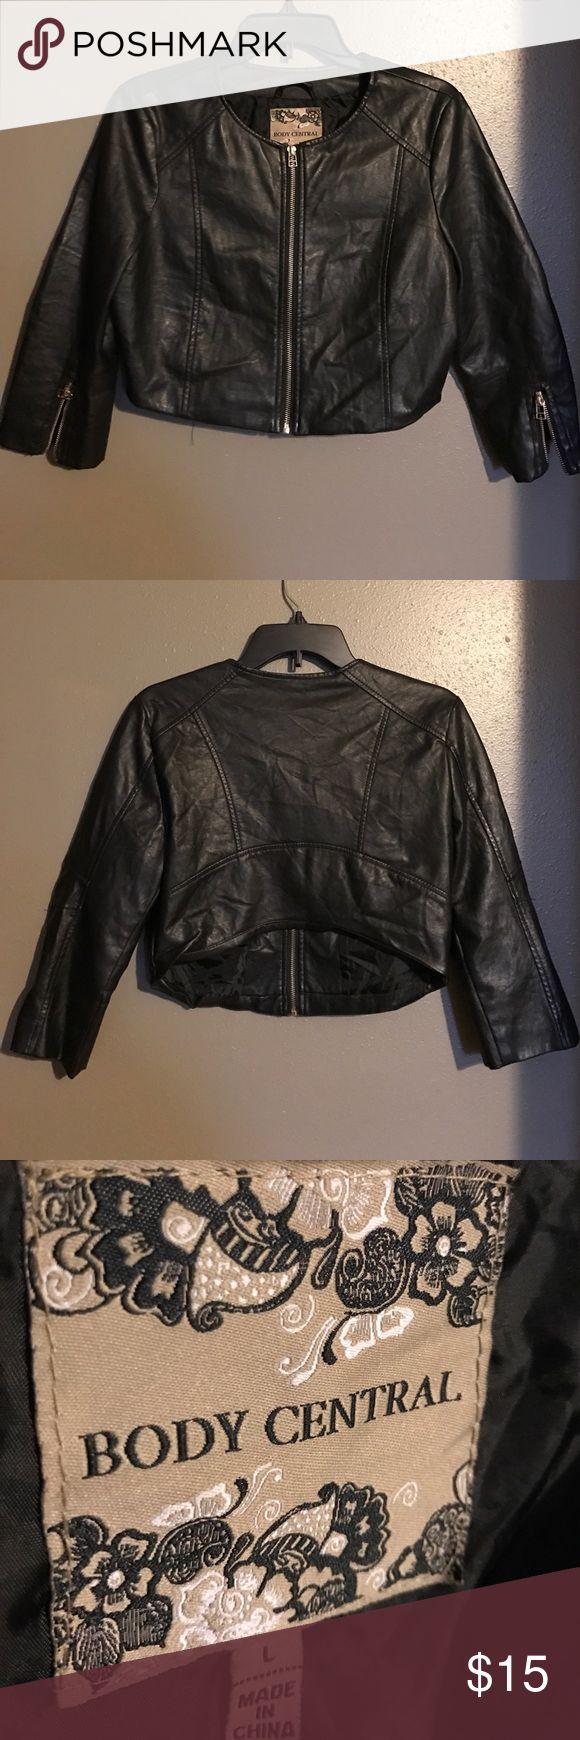 Faux short leather jacket Black faux short leather jacket. Lightly worn. Body Central Jackets & Coats